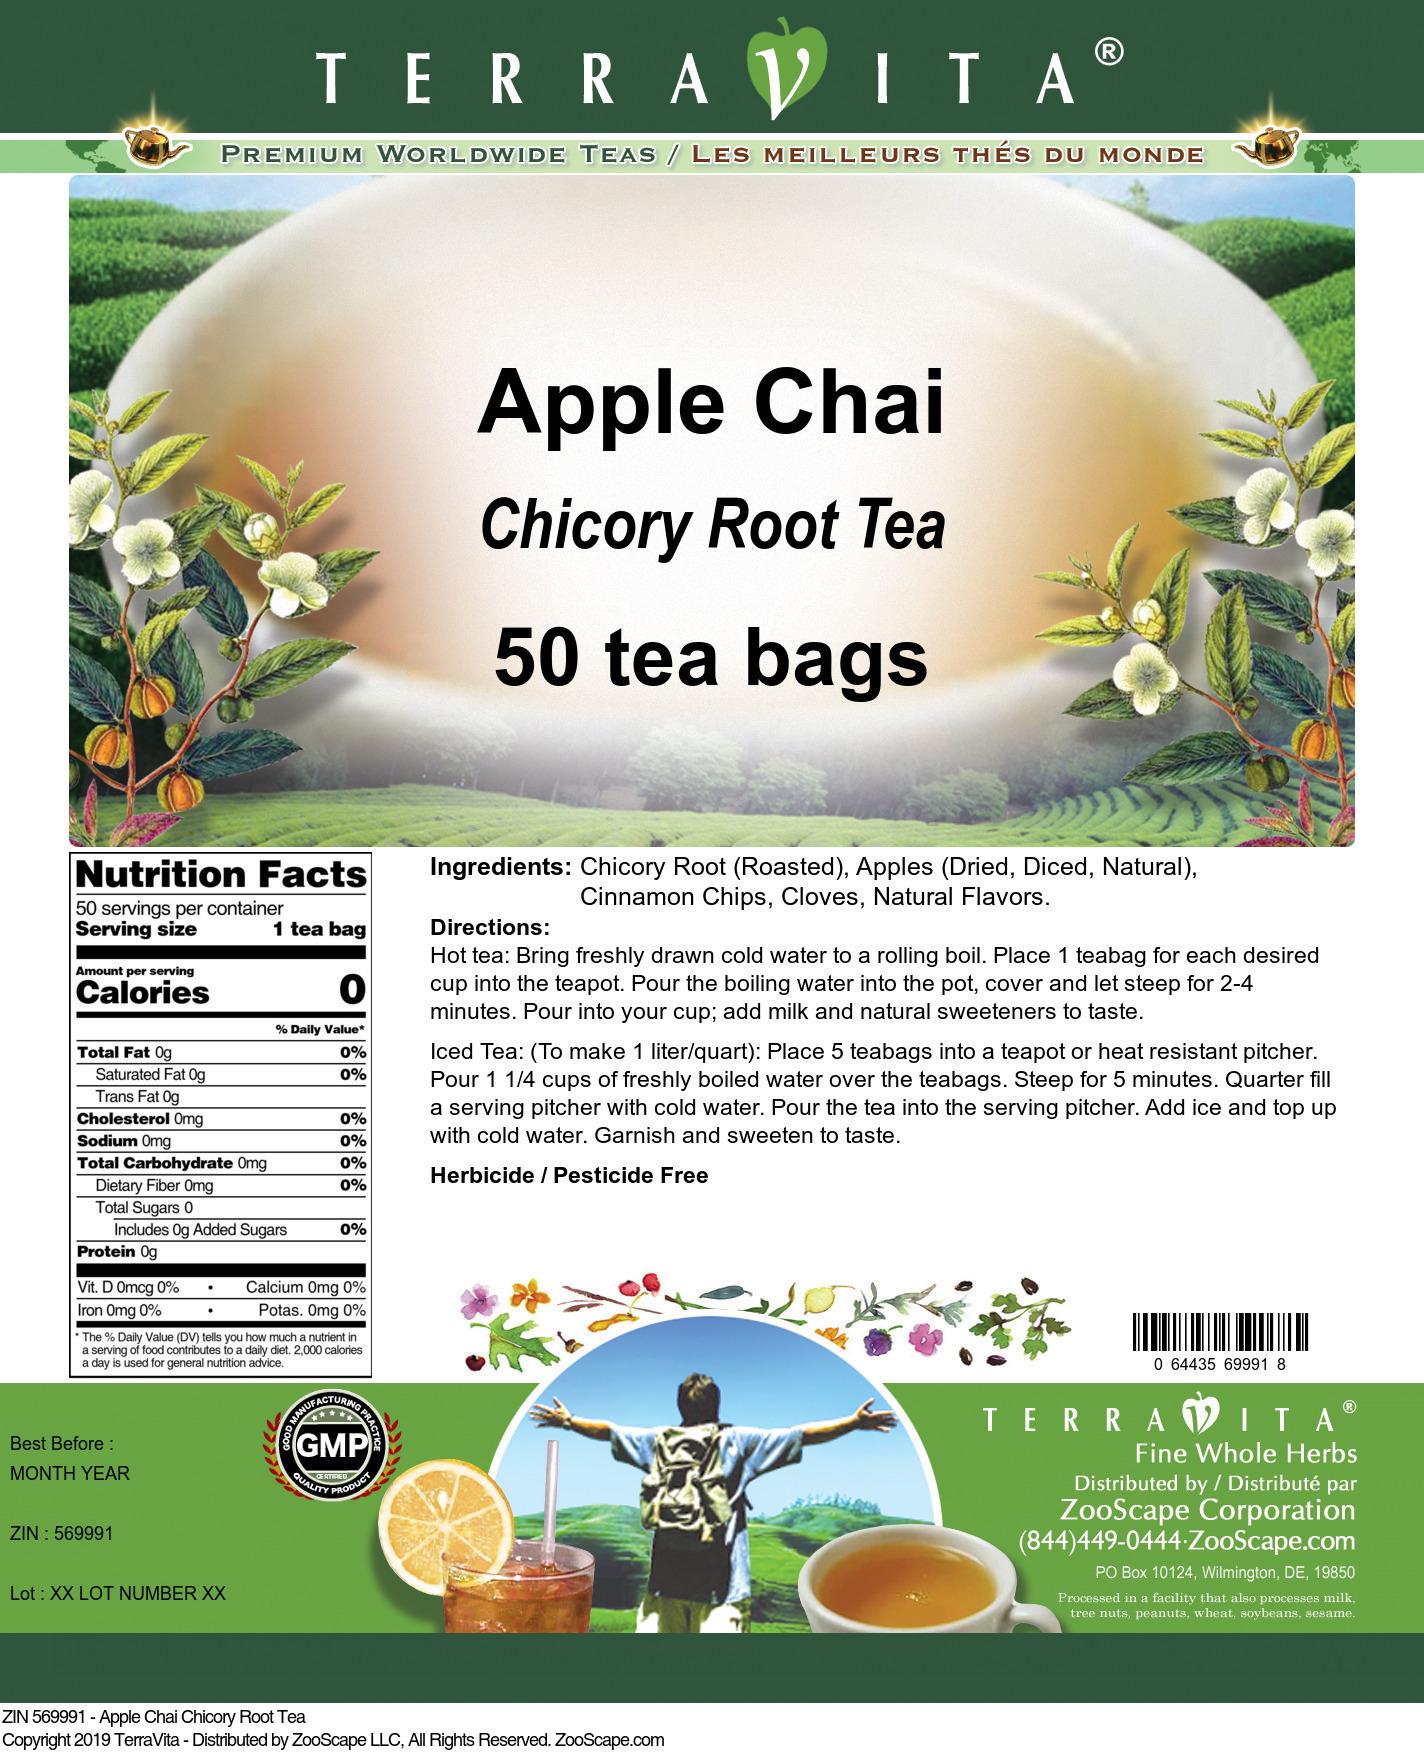 Apple Chai Chicory Root Tea